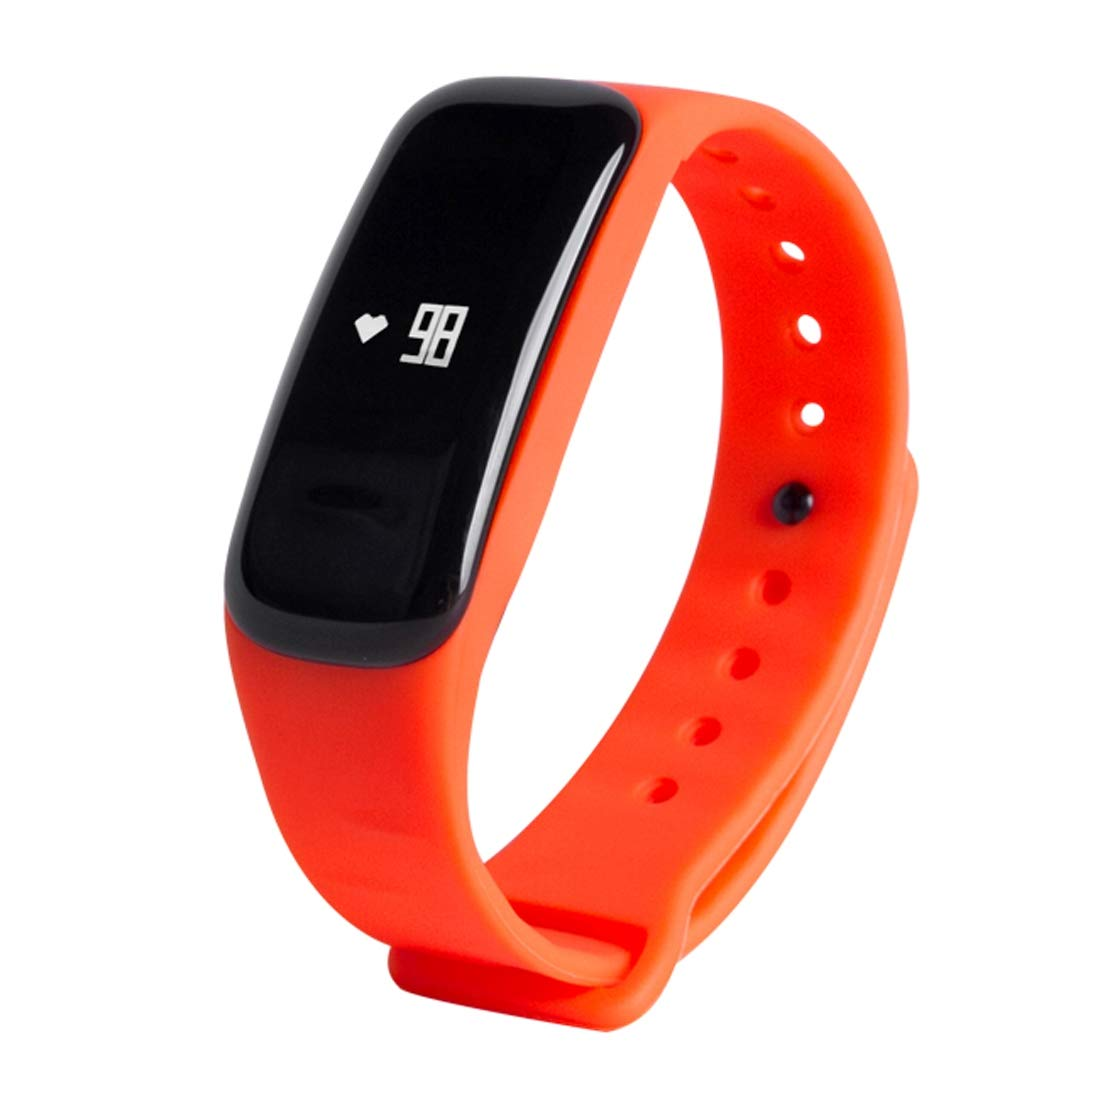 orange HAWEEL Fitness Tracker HR, M8 Blood Pressure Heart Rate blueeetooth Smart Bracelet, Pedometer Sleep Monitor Call Reminder Distance Calories Blood Oxygen(Black)